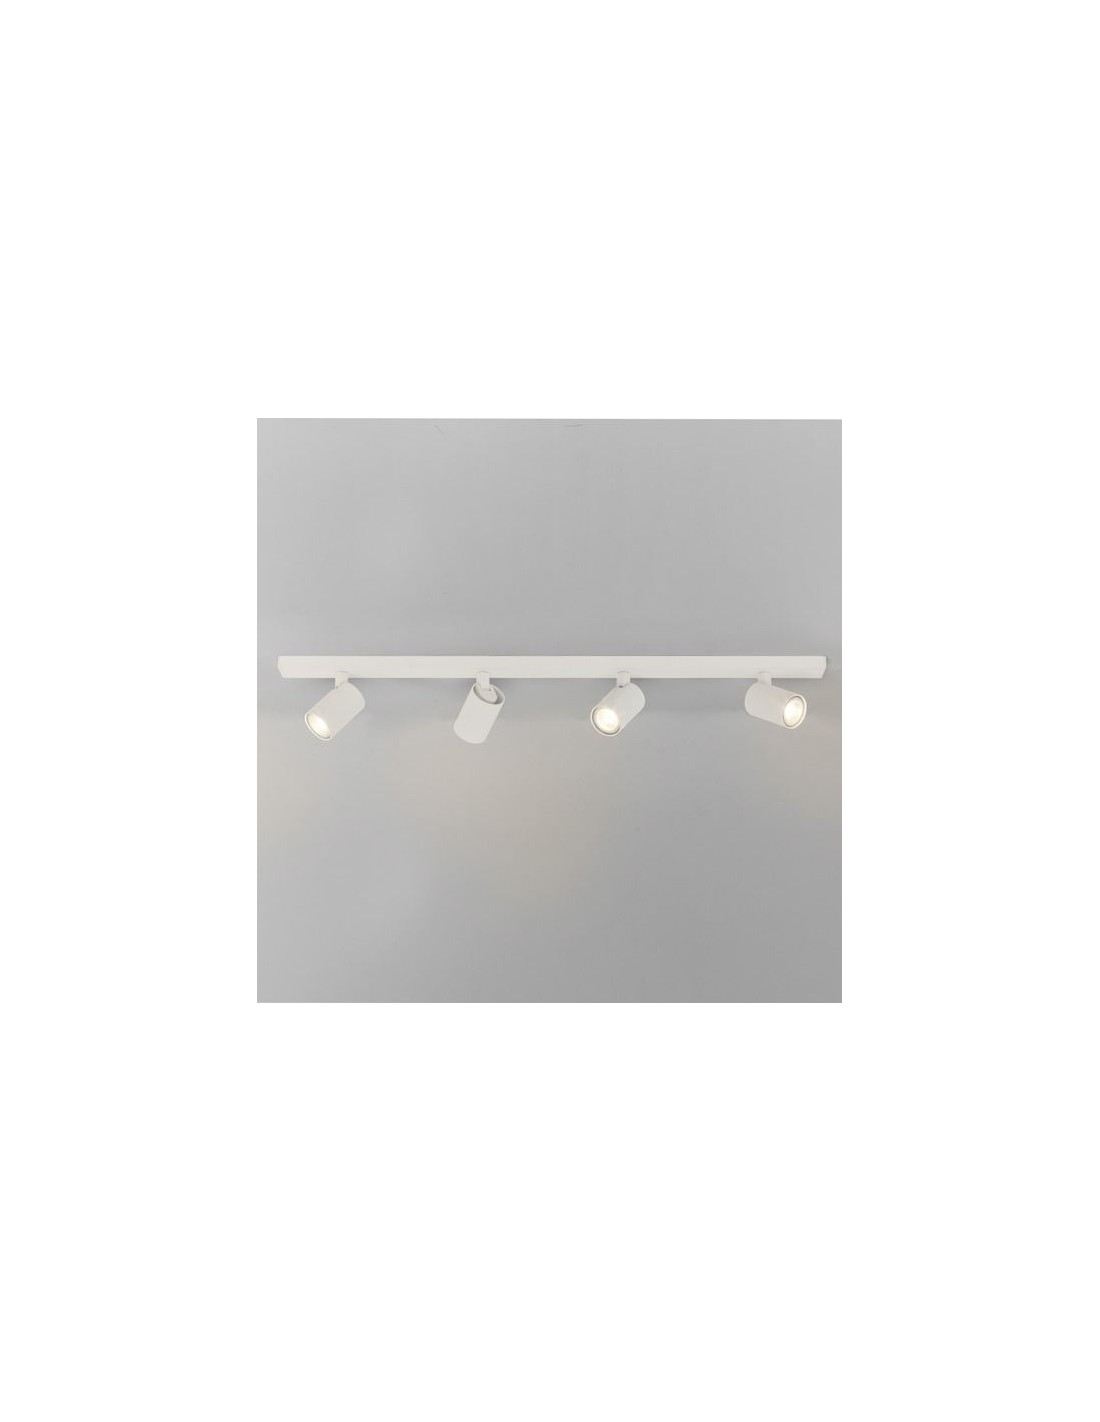 Plafonnier ascoli 4 bar blanc astro lighting - valente design